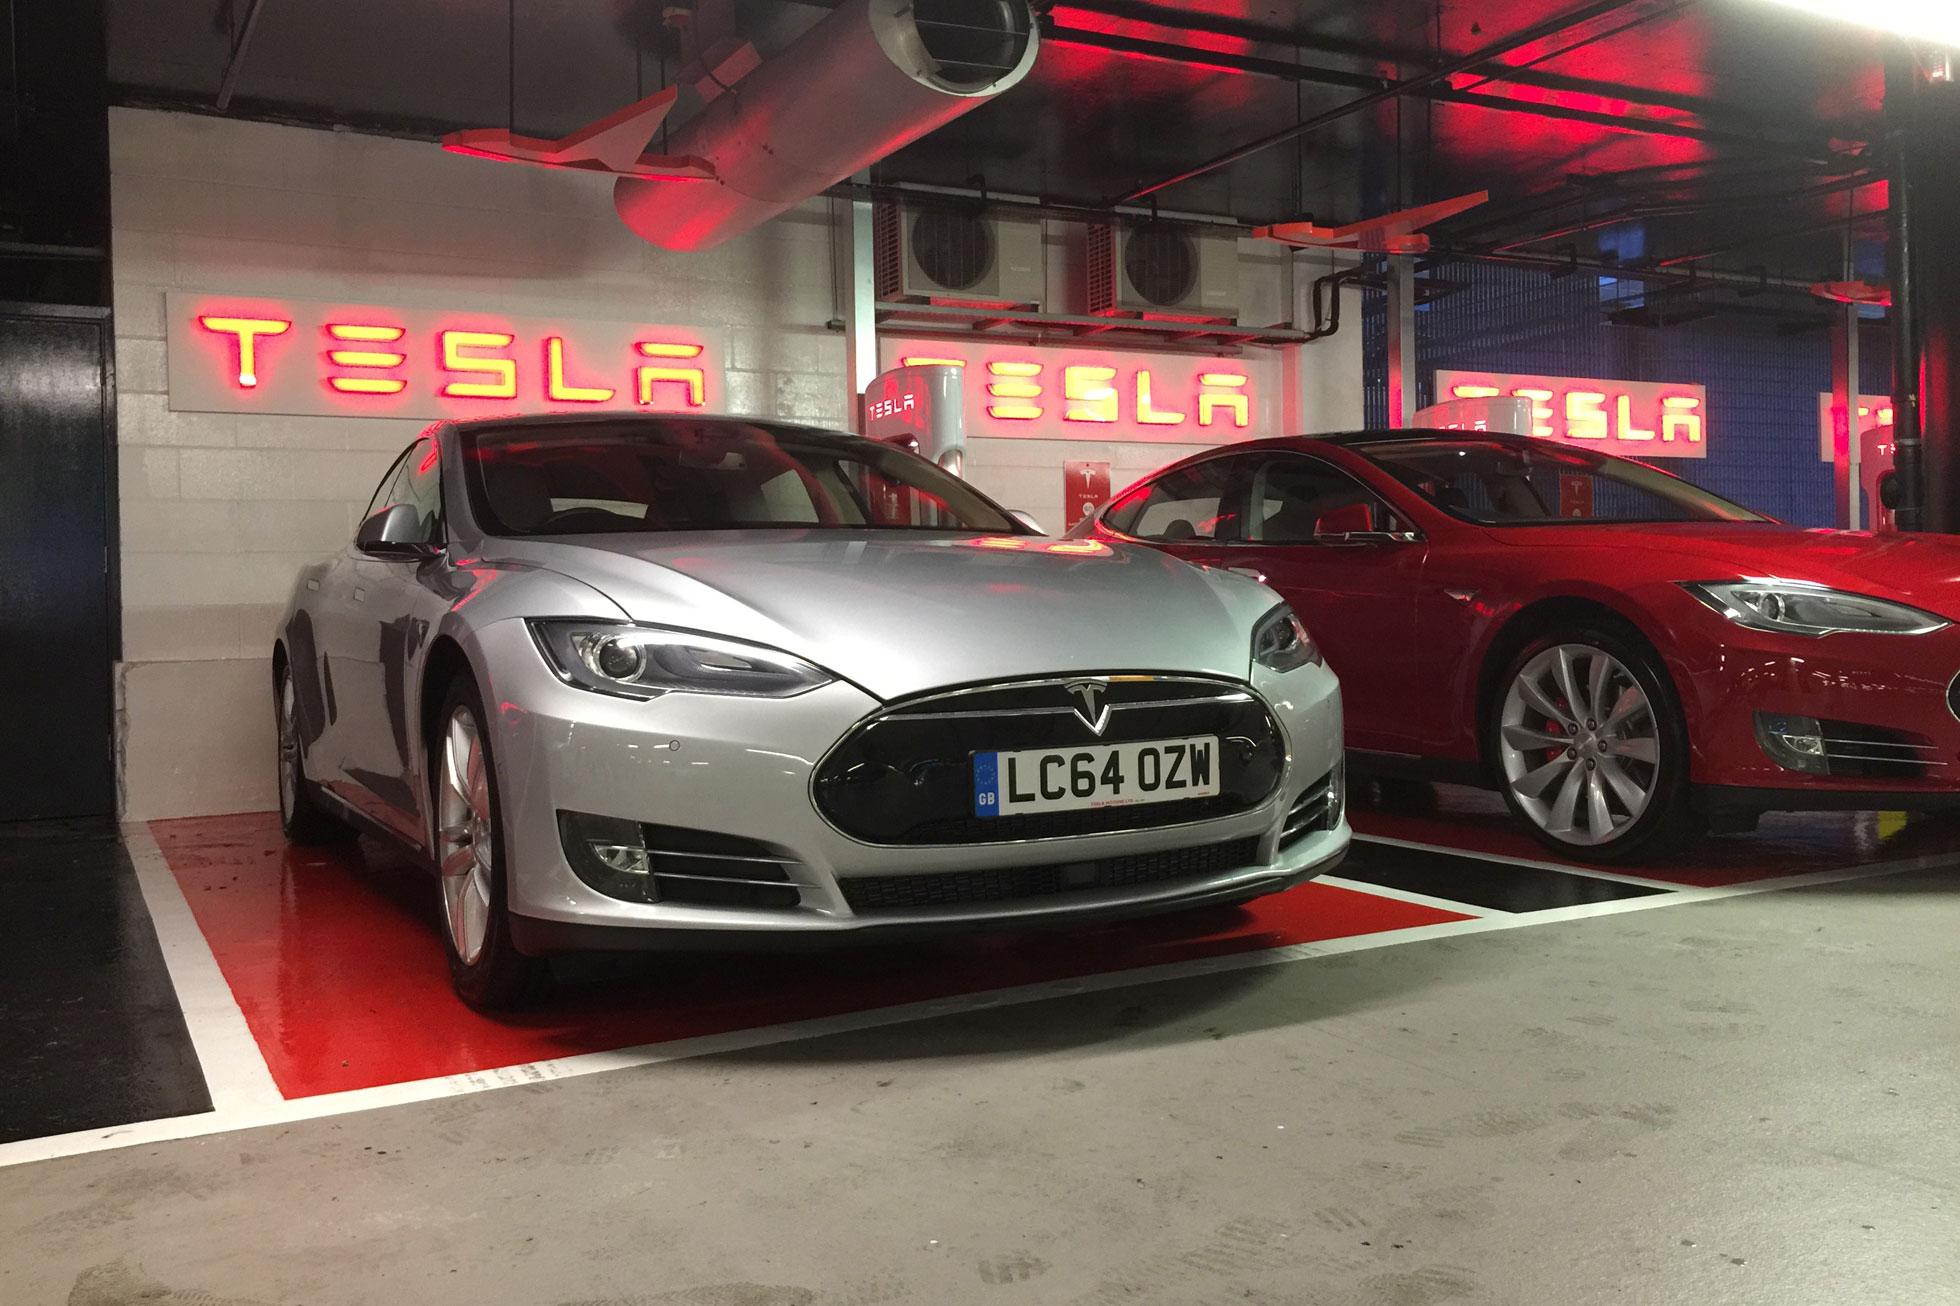 8_Tesla_Model_S_Motoring Research